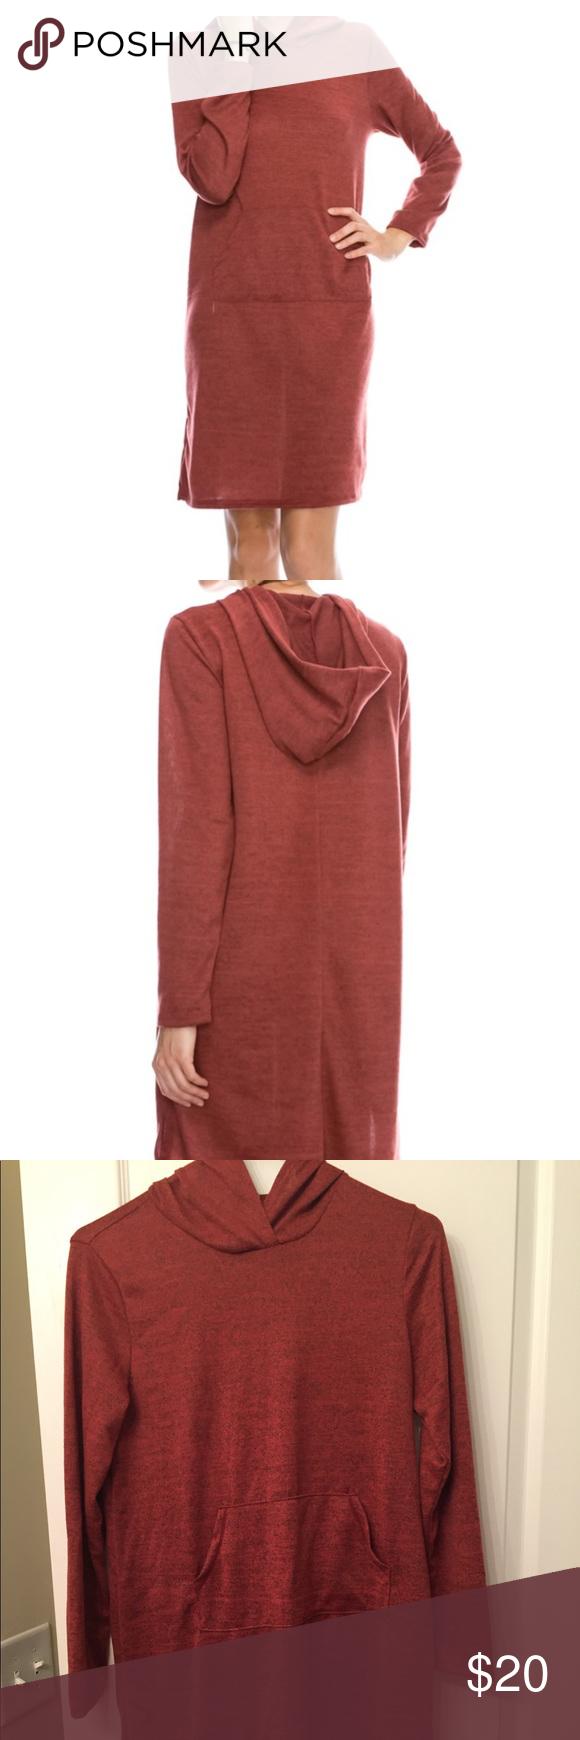 Long Sleeve Hoodie Dress Brand New Red Hoodie Dress Never Warn Super Soft Great For Looking Nice But Also Being Co Dress Brands Hoodie Dress Clothes Design [ 1740 x 580 Pixel ]